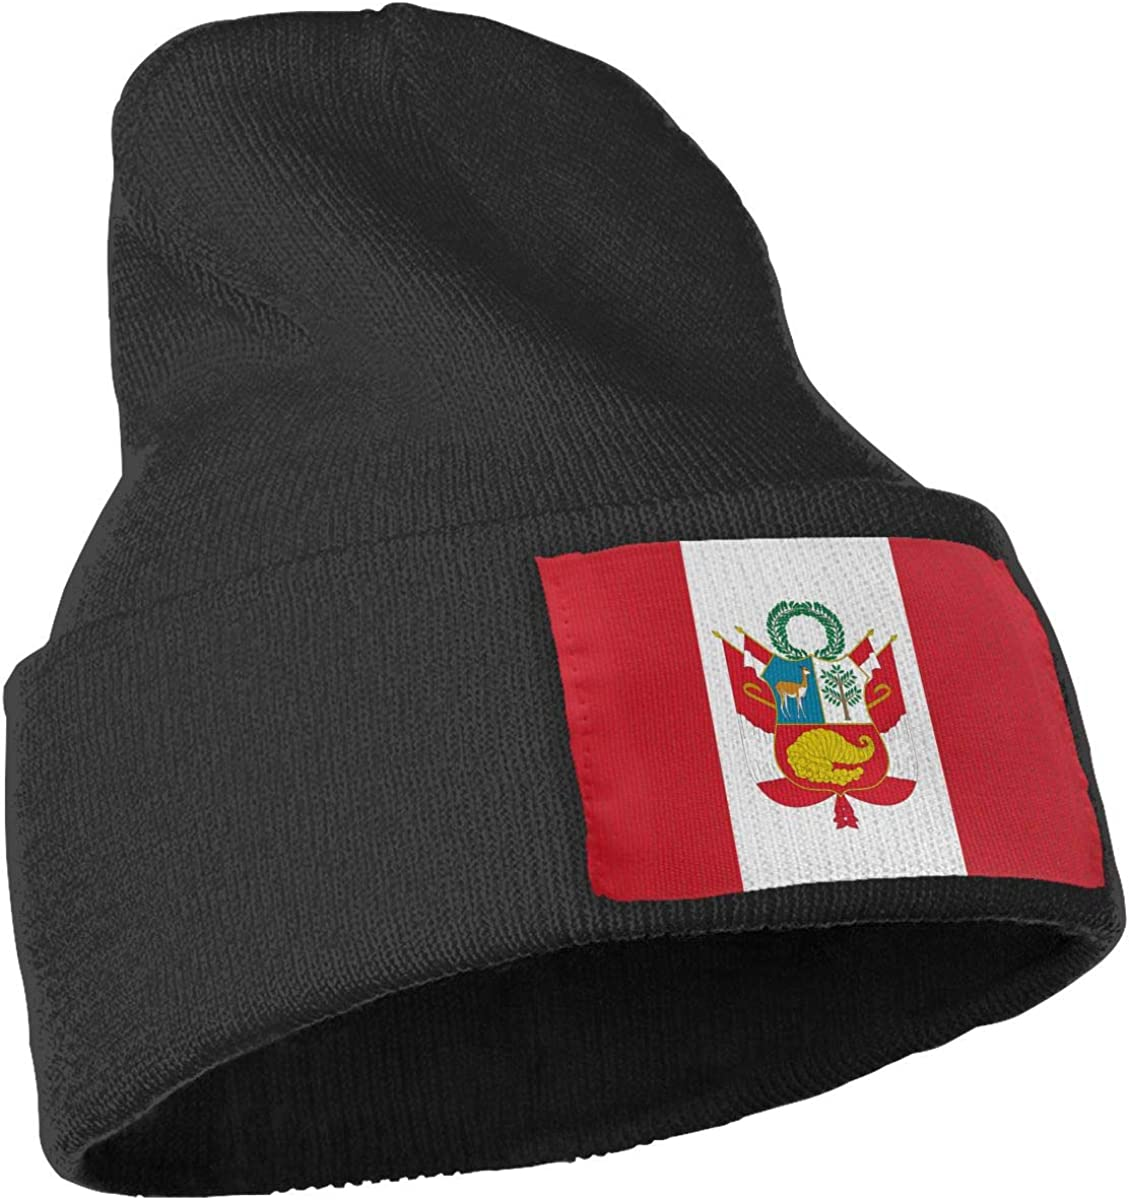 QZqDQ Peru Flag Unisex Fashion Knitted Hat Luxury Hip-Hop Cap